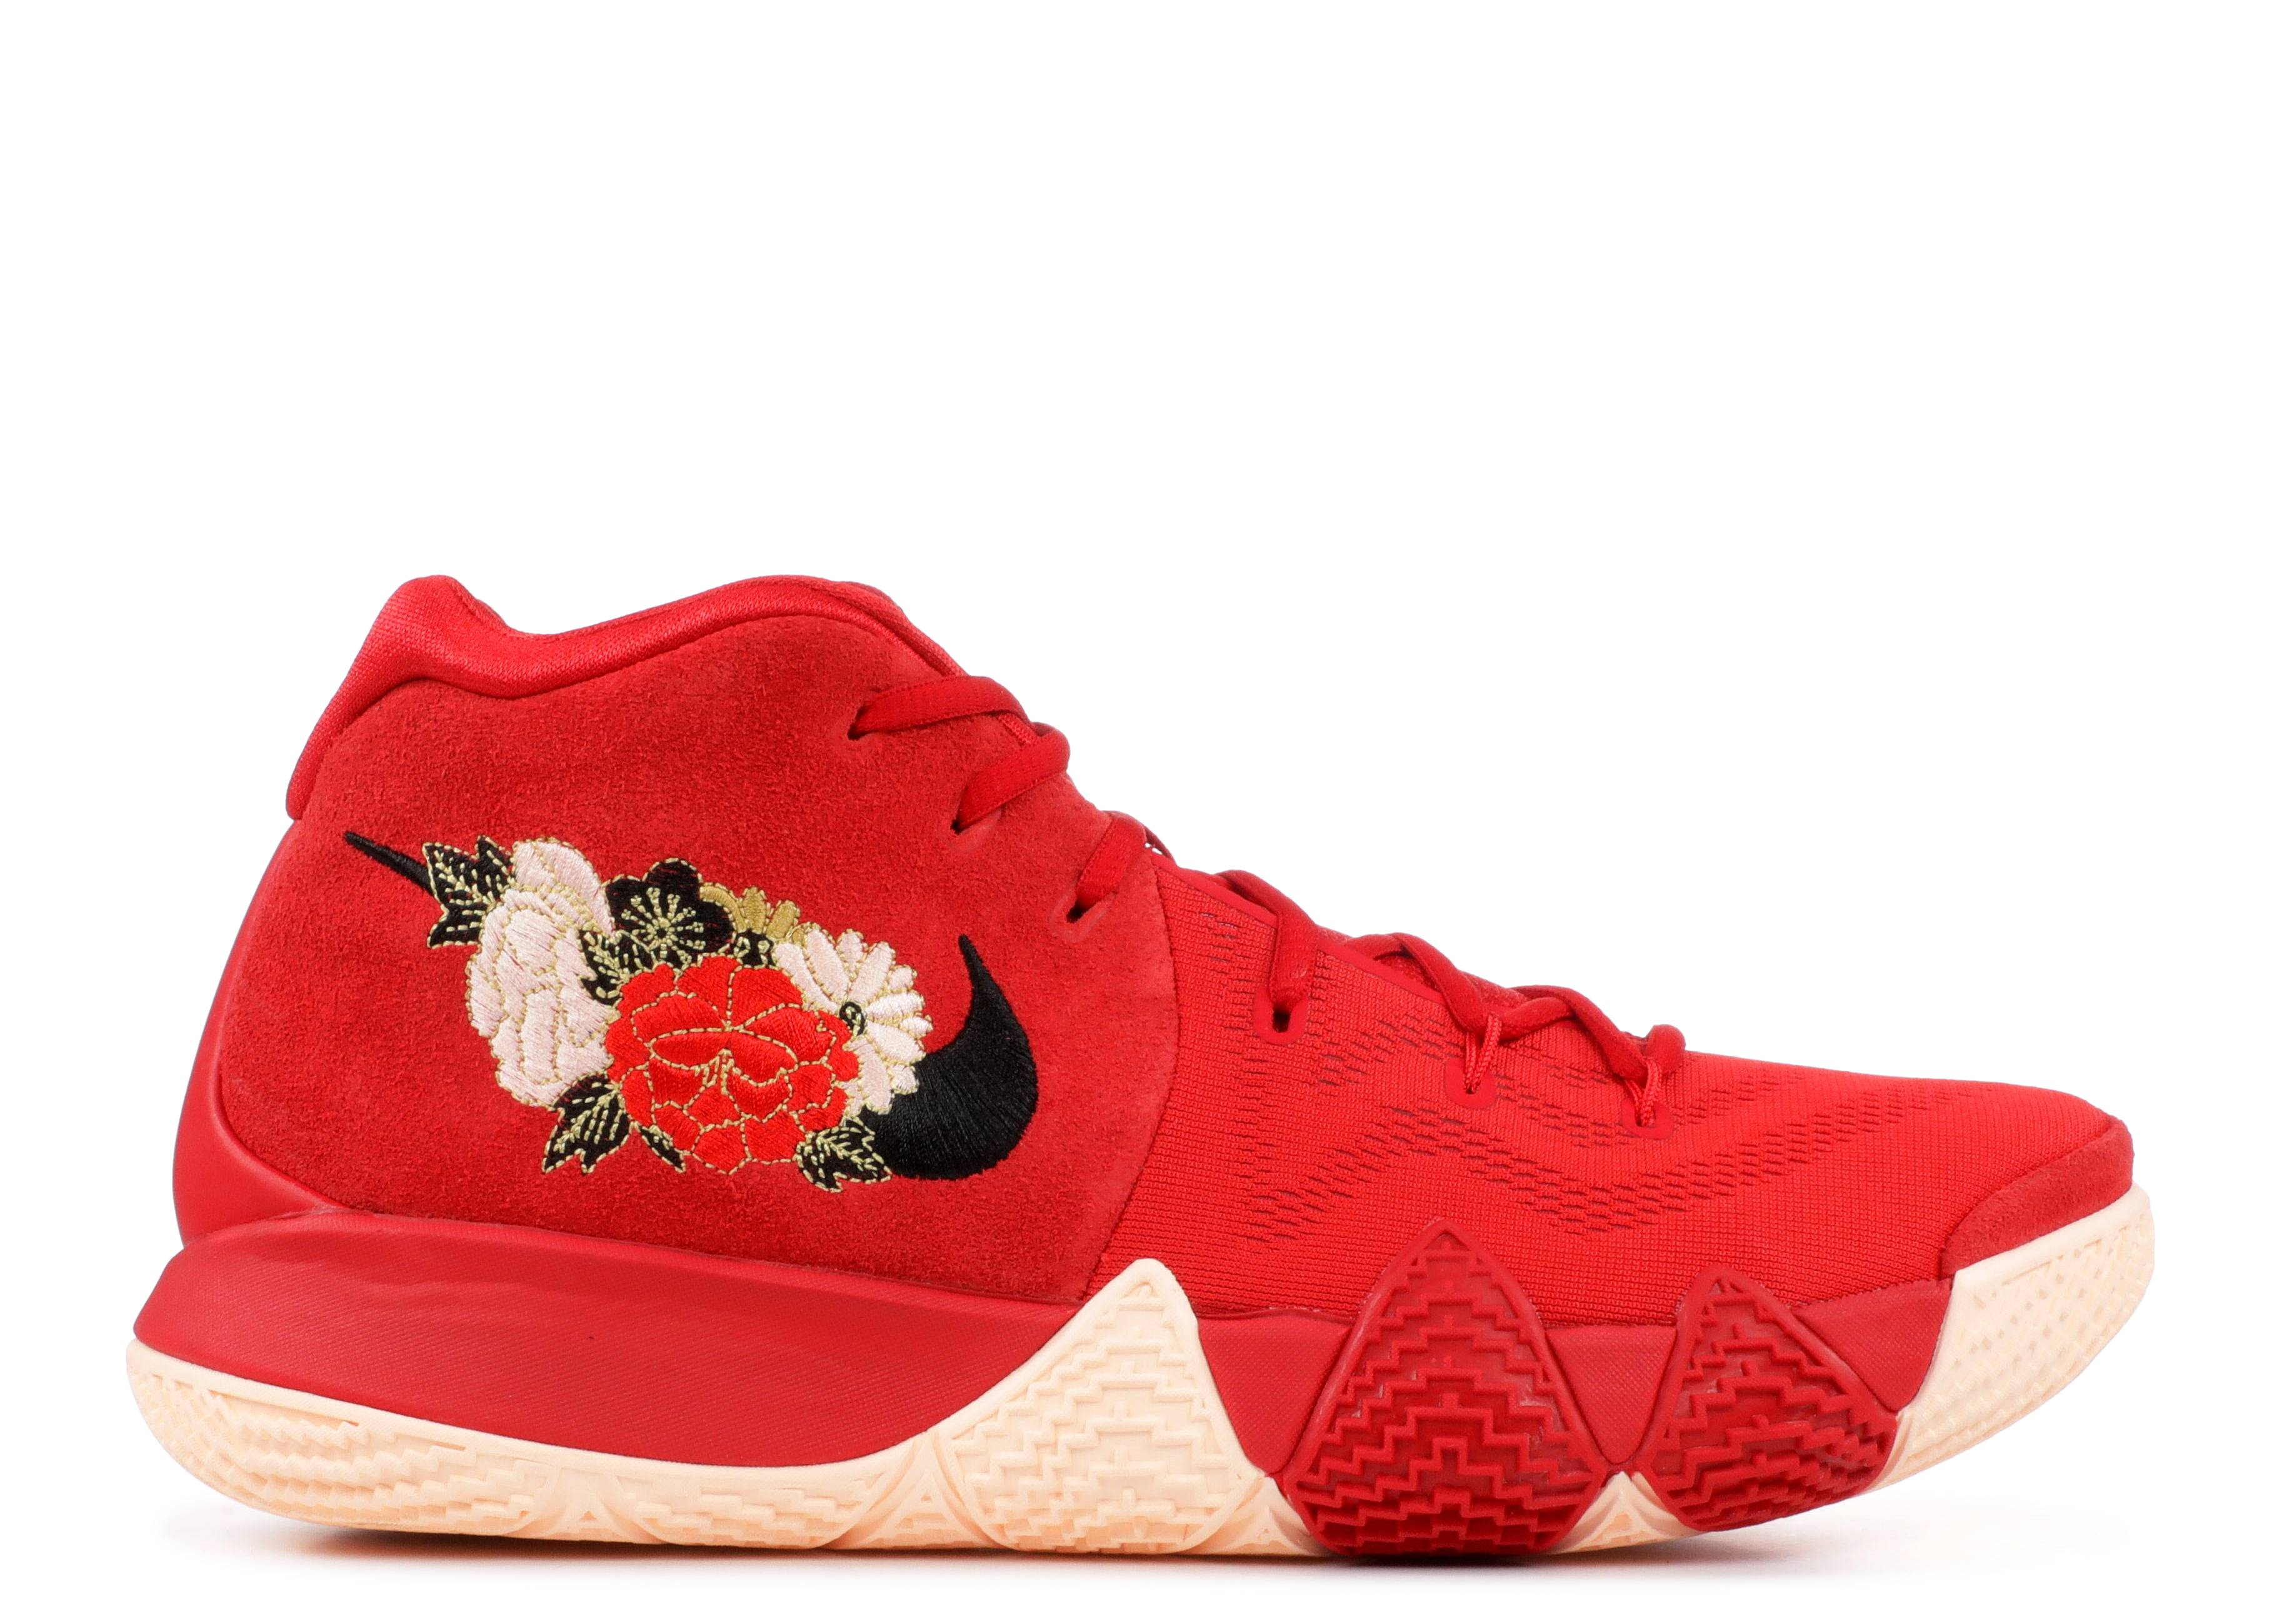 Kyrie Irving - Nike Basketball - Nike  92bf3f0f5